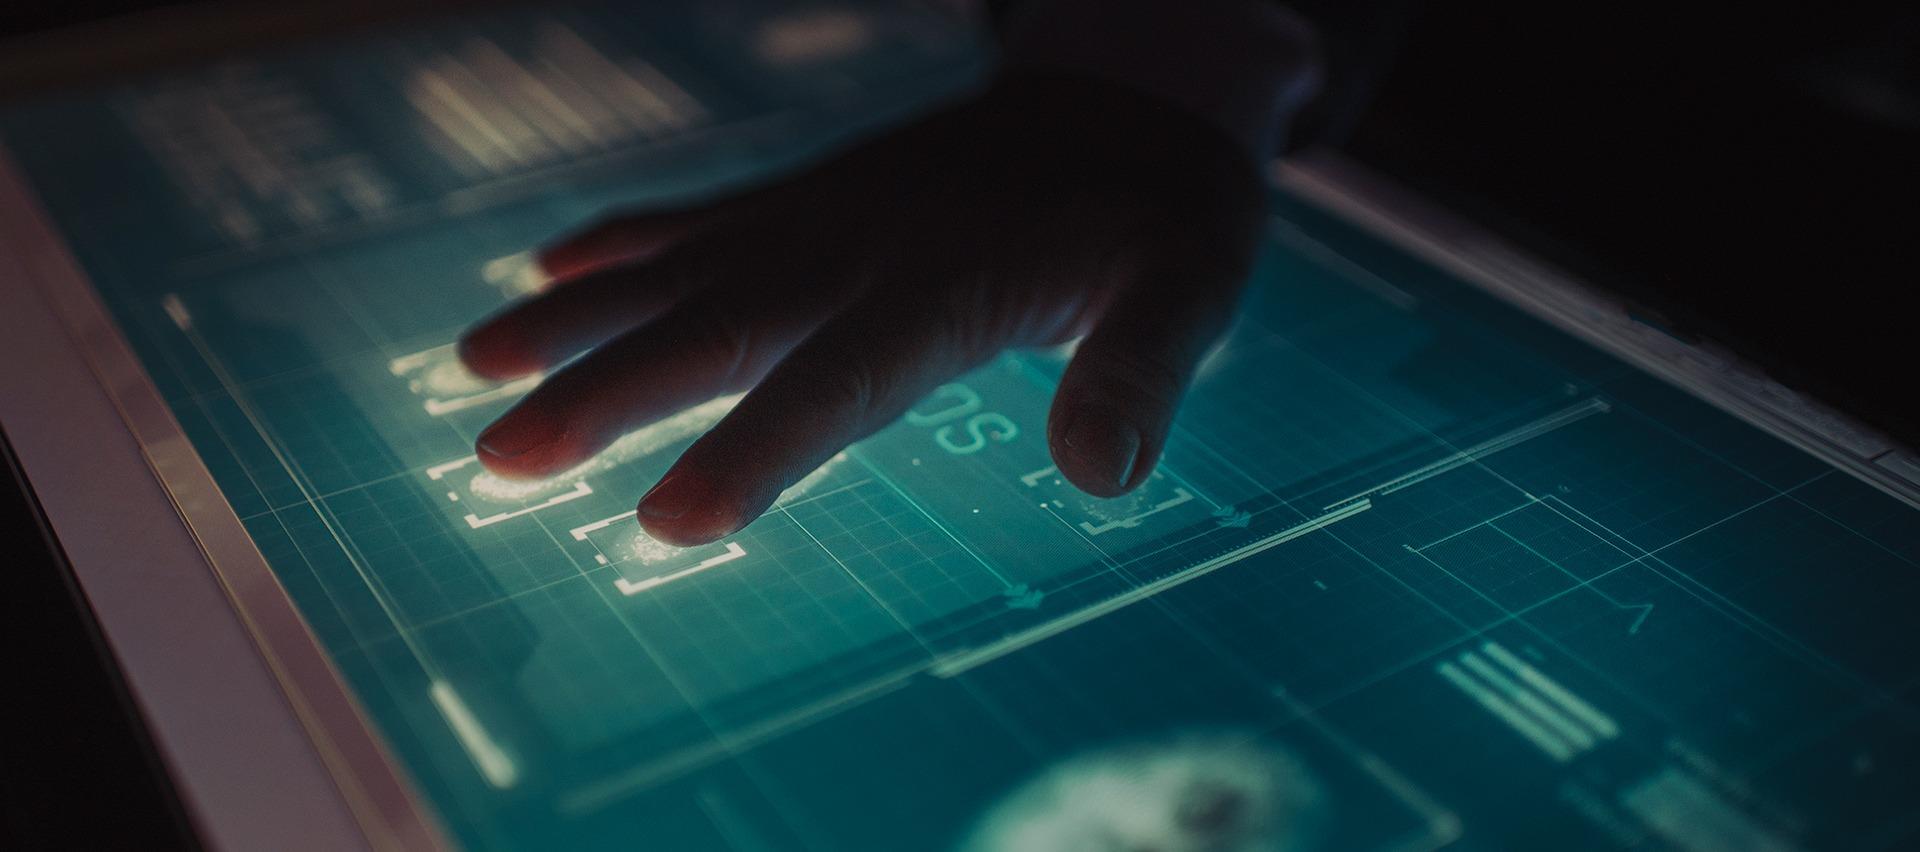 Open innovation: a via mais eficiente para resolver problemas de empresas e consumidores